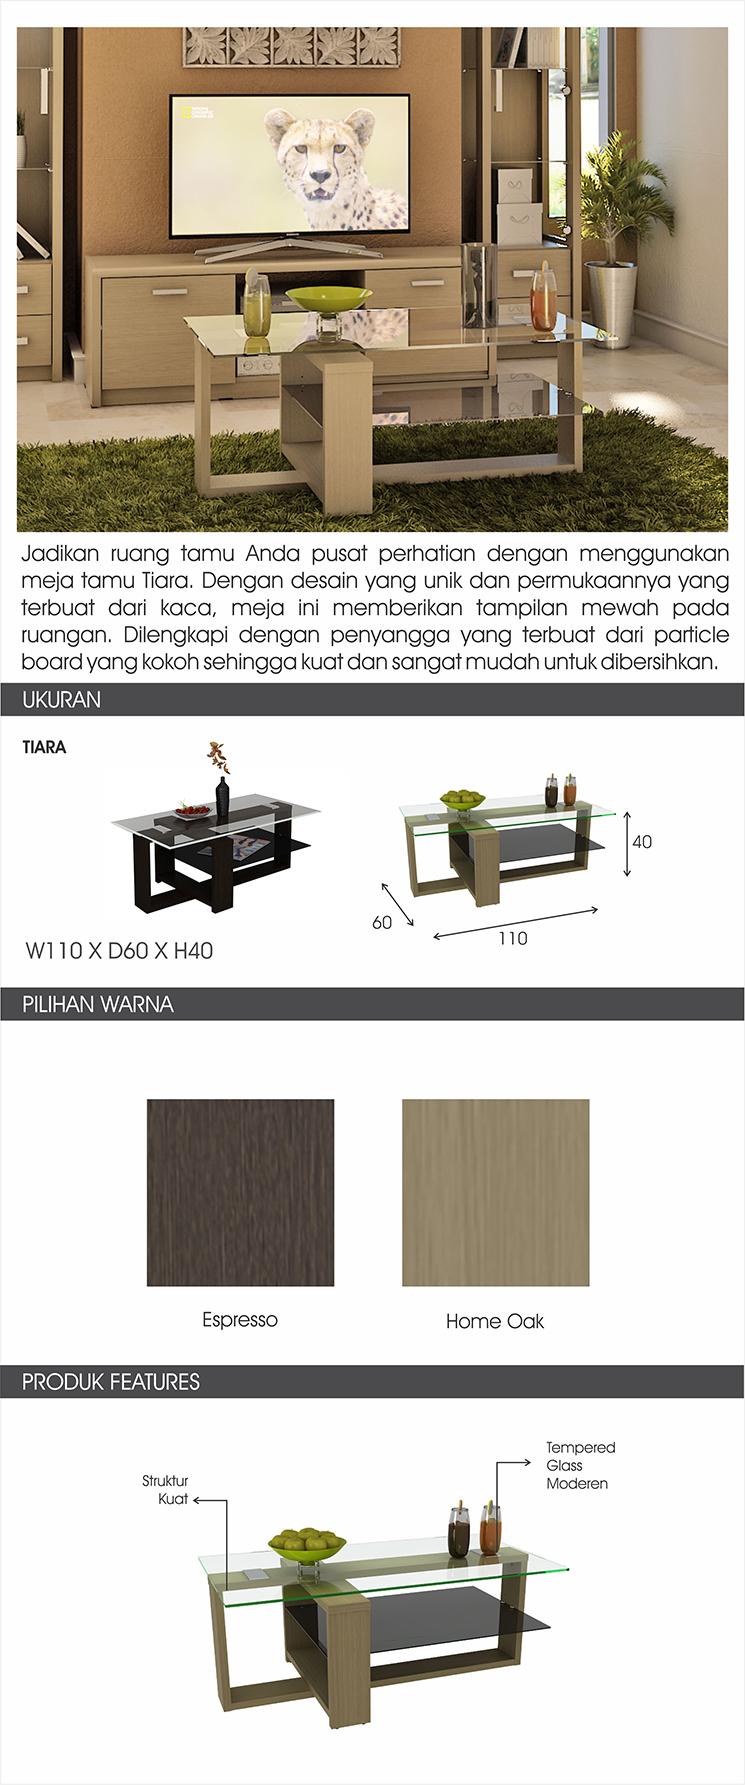 Pro Design Tiara Meja Tamu Espresso Khusus Jawa Bali Daftar Harga Brico 120 Sanremo Light Black